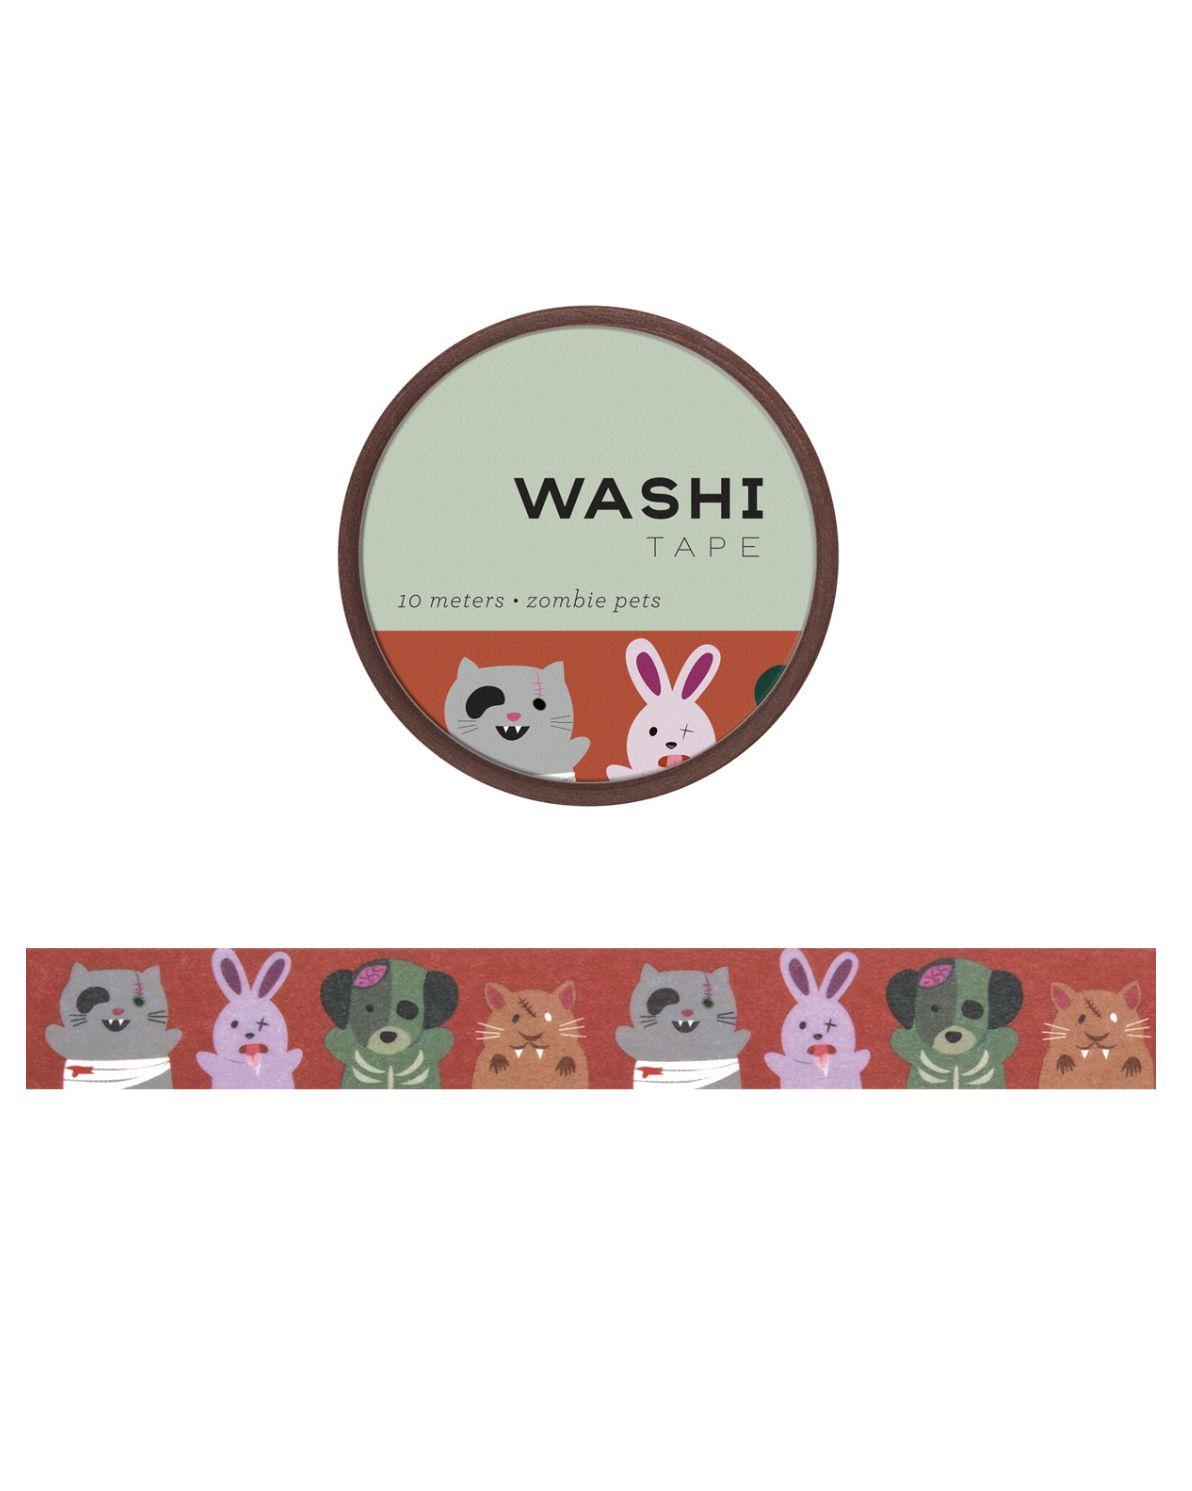 Washi tape - Zombie Pets